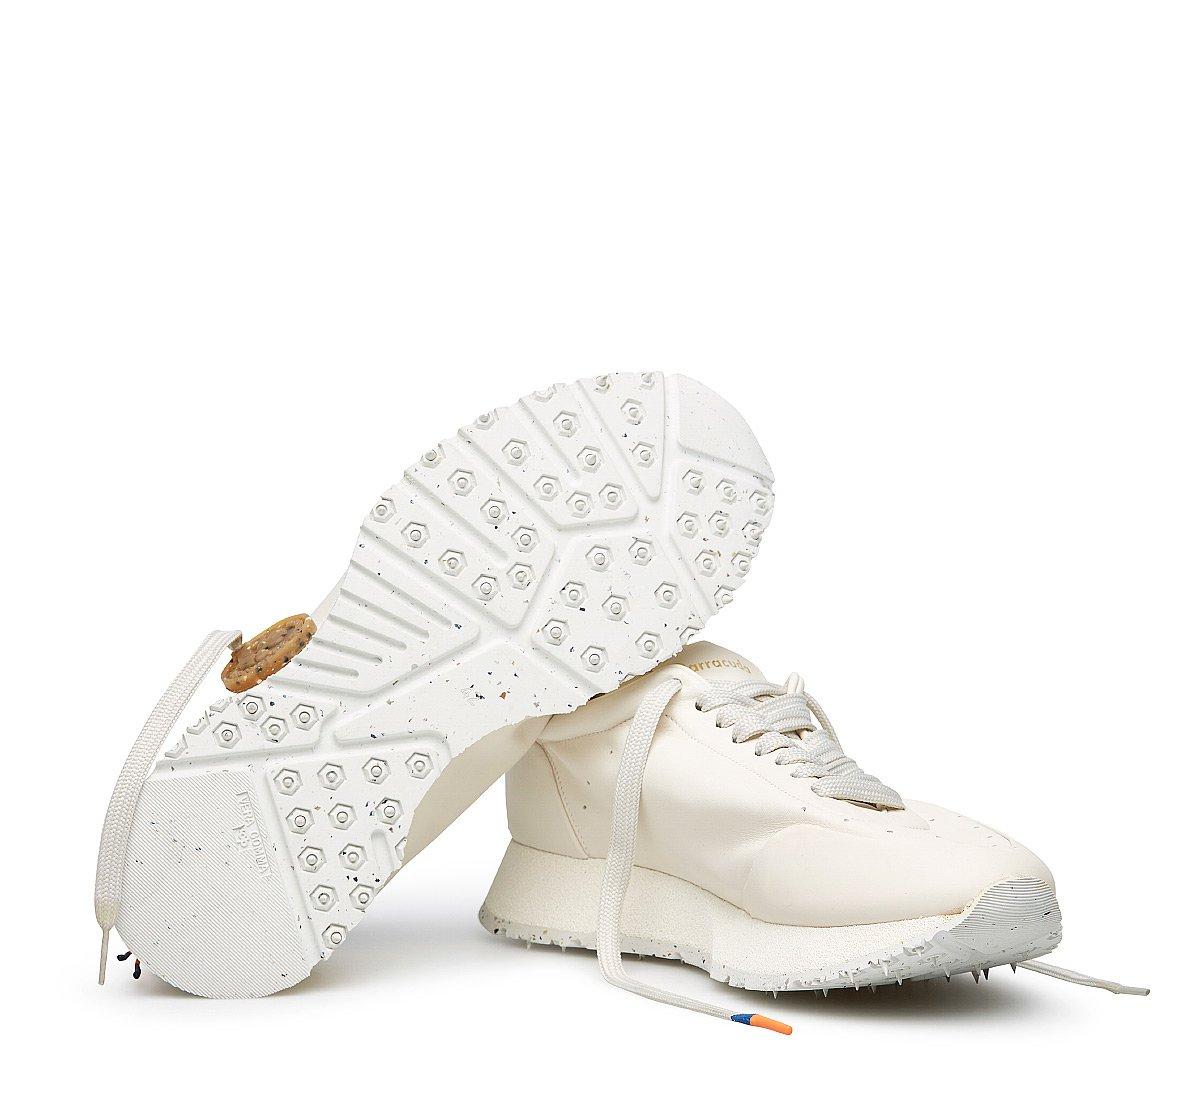 ROCKET sneakers